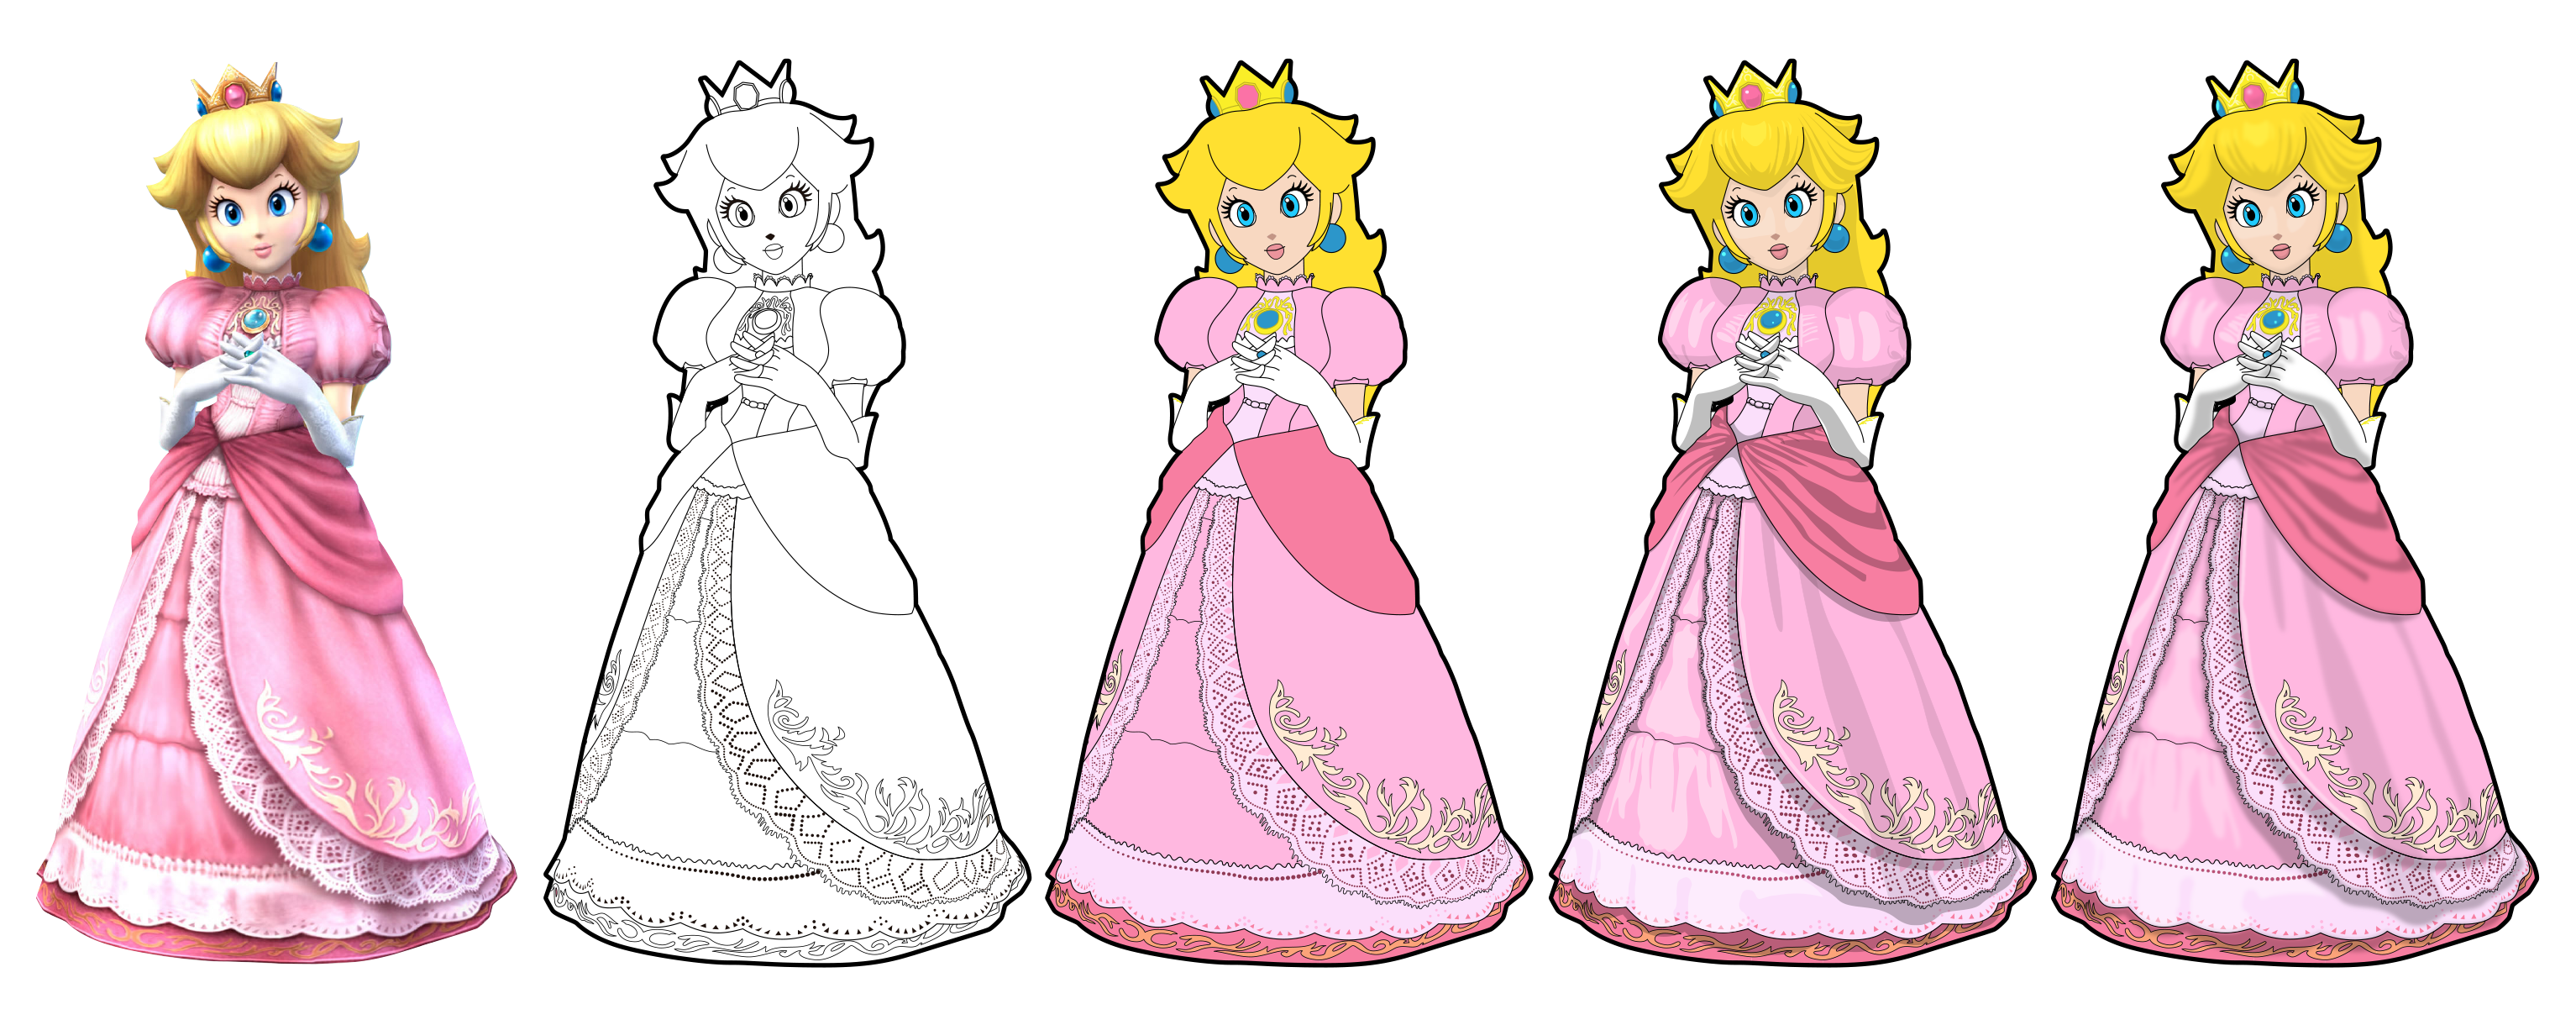 how to make princess drawing